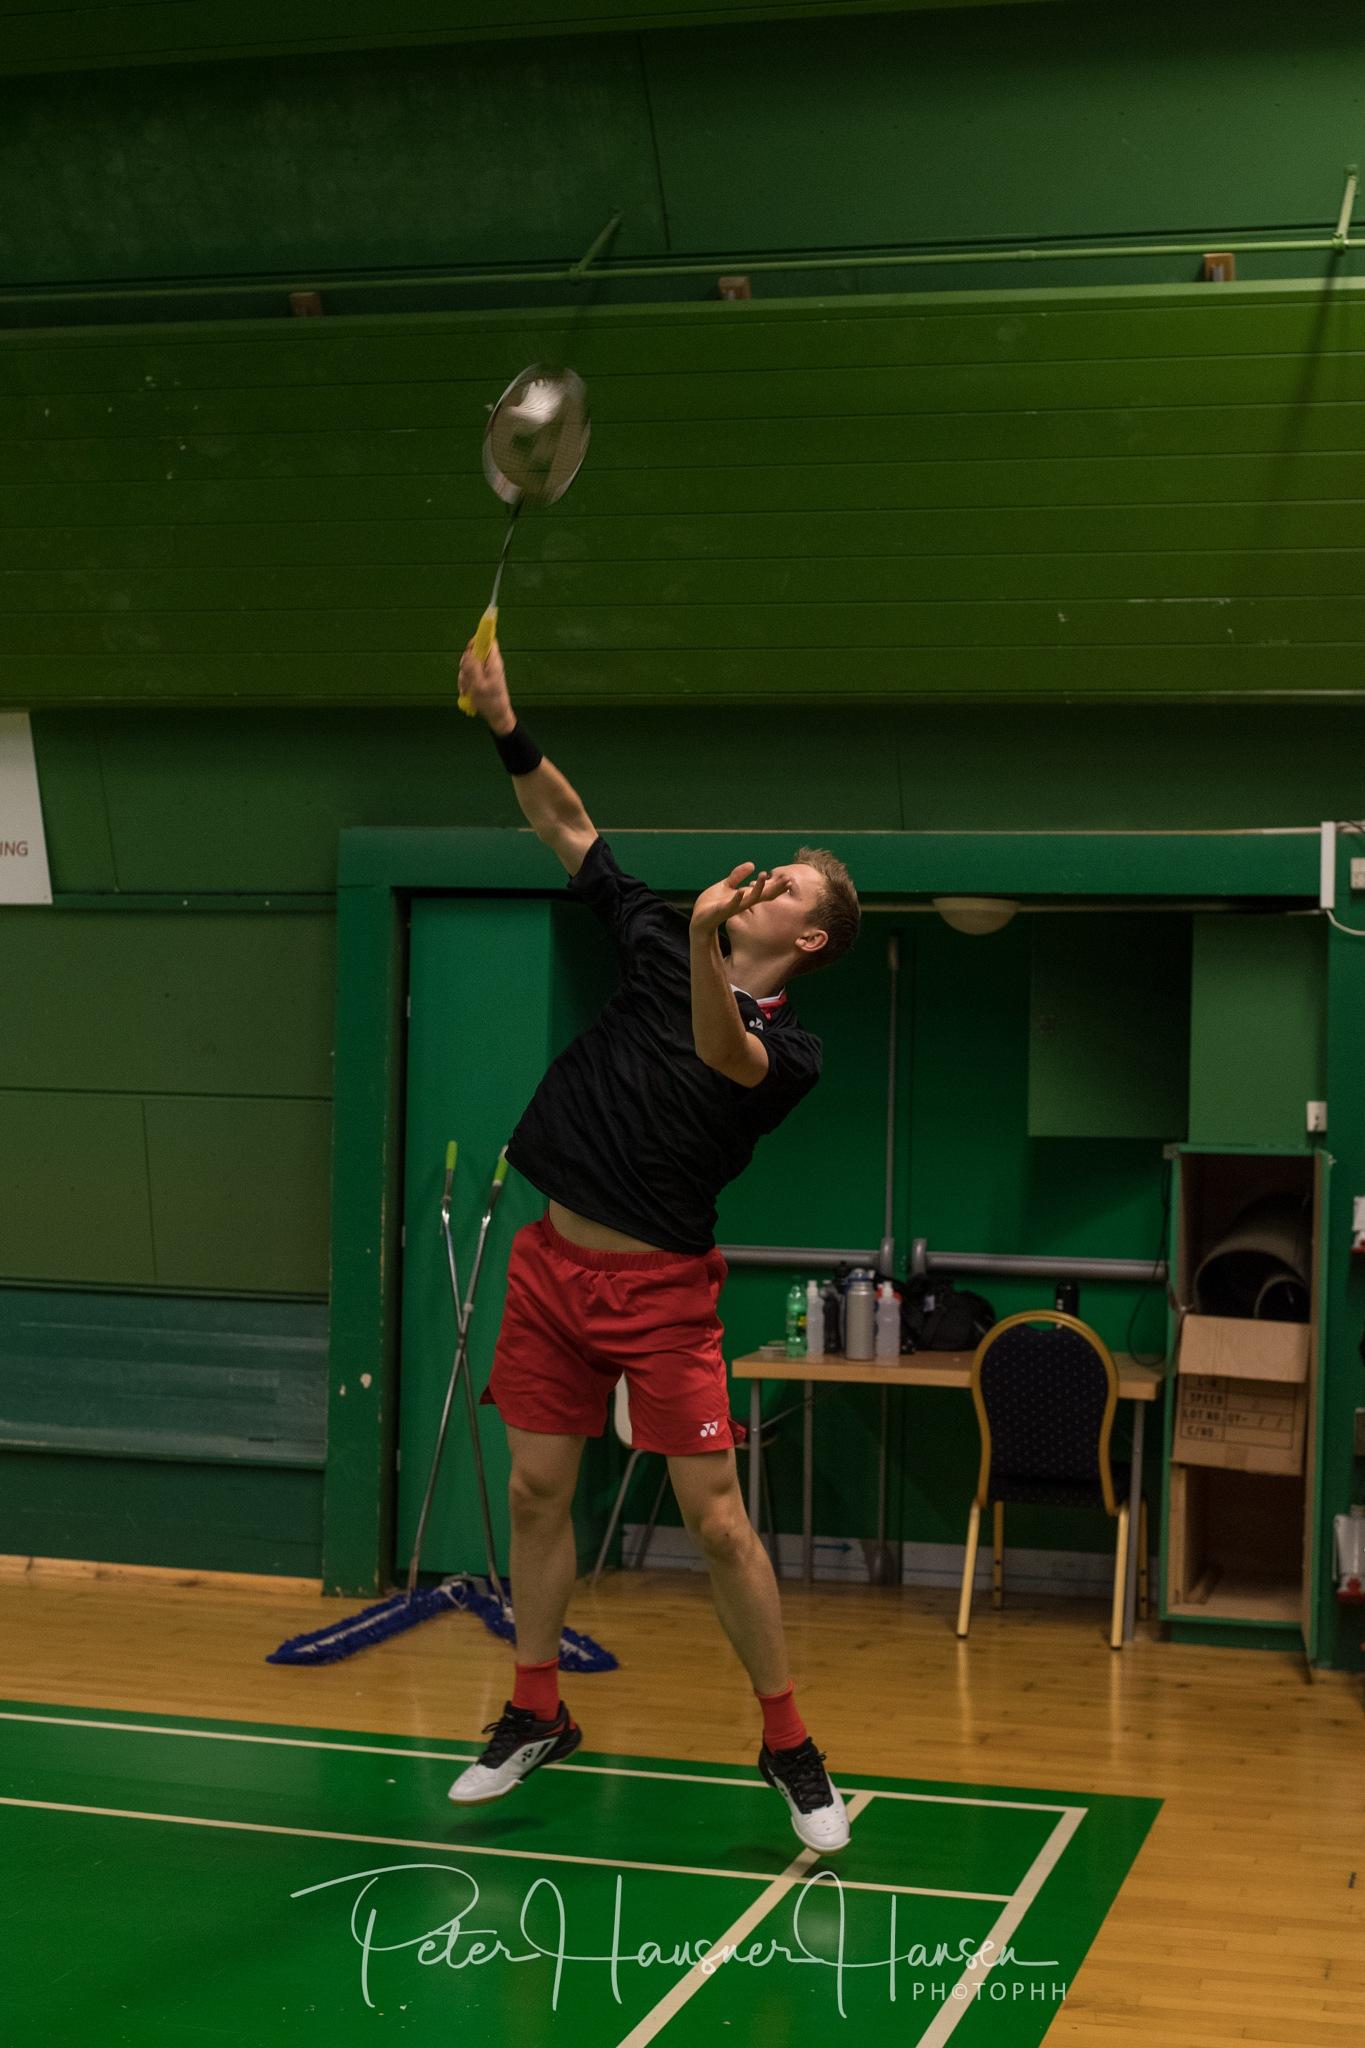 The world champion practice Badminton - Viktor Axelsen  by PHOTOPHH.1